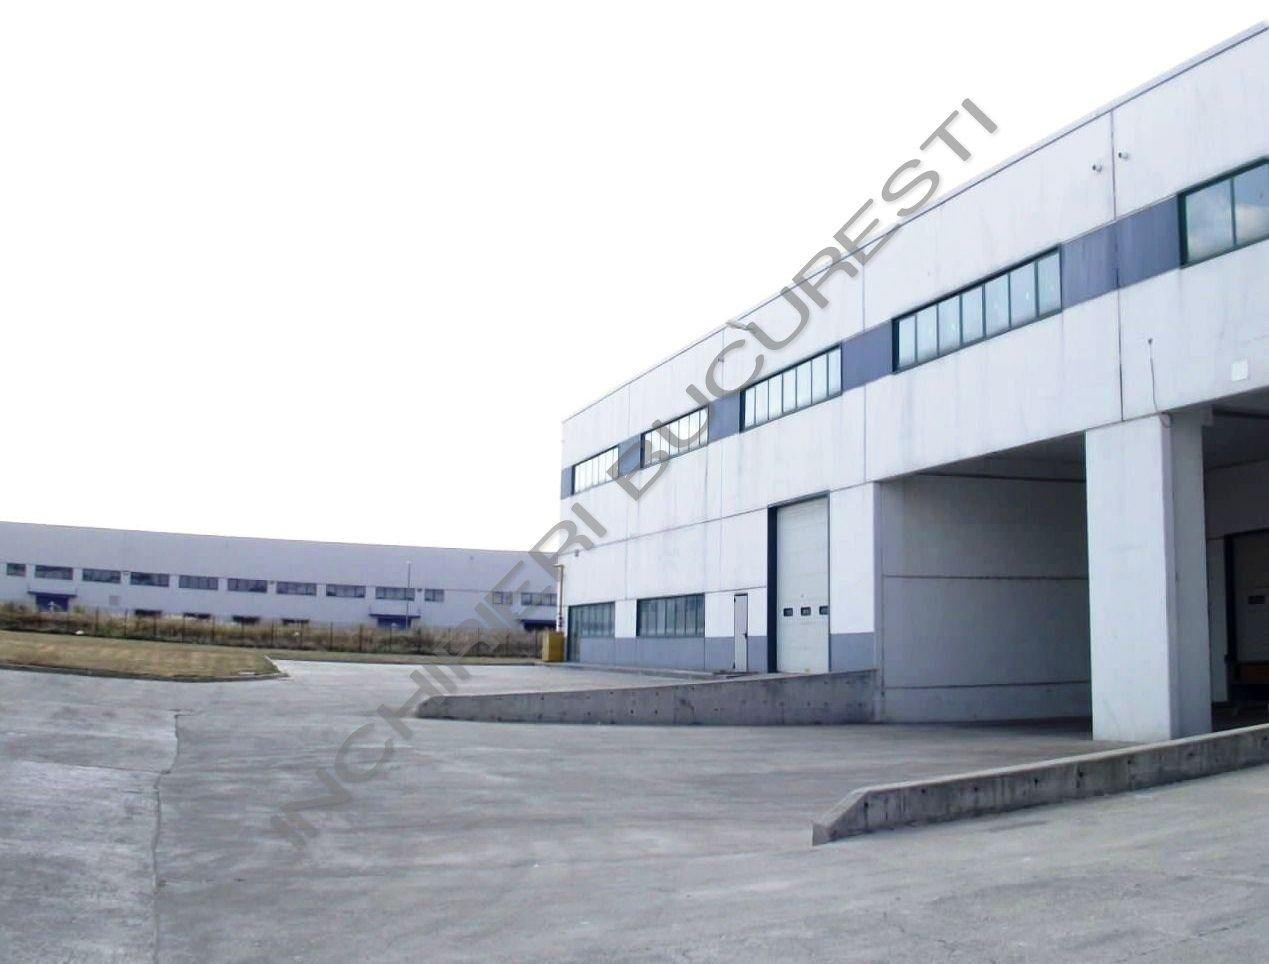 A1 Bucuresti Pitesti spatiu industrial de inchiriat 2620